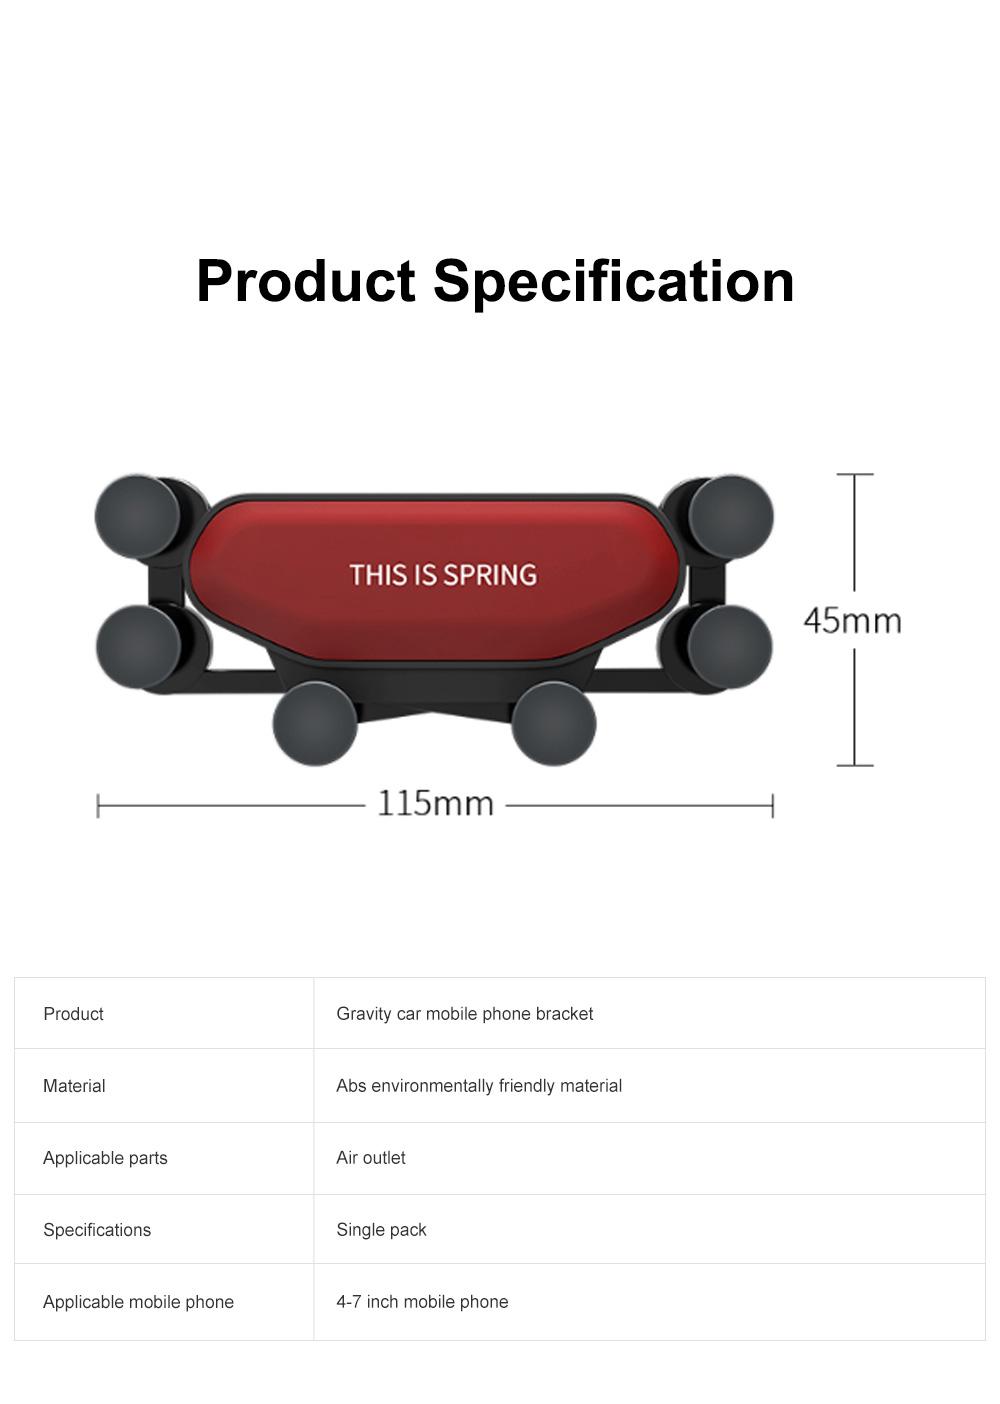 Suitable For iPhone X XR XS MAX Samsung S8 S9 Car Vent Phone Holder Navigation Mobile Bracket Car Gravity Bracket 9